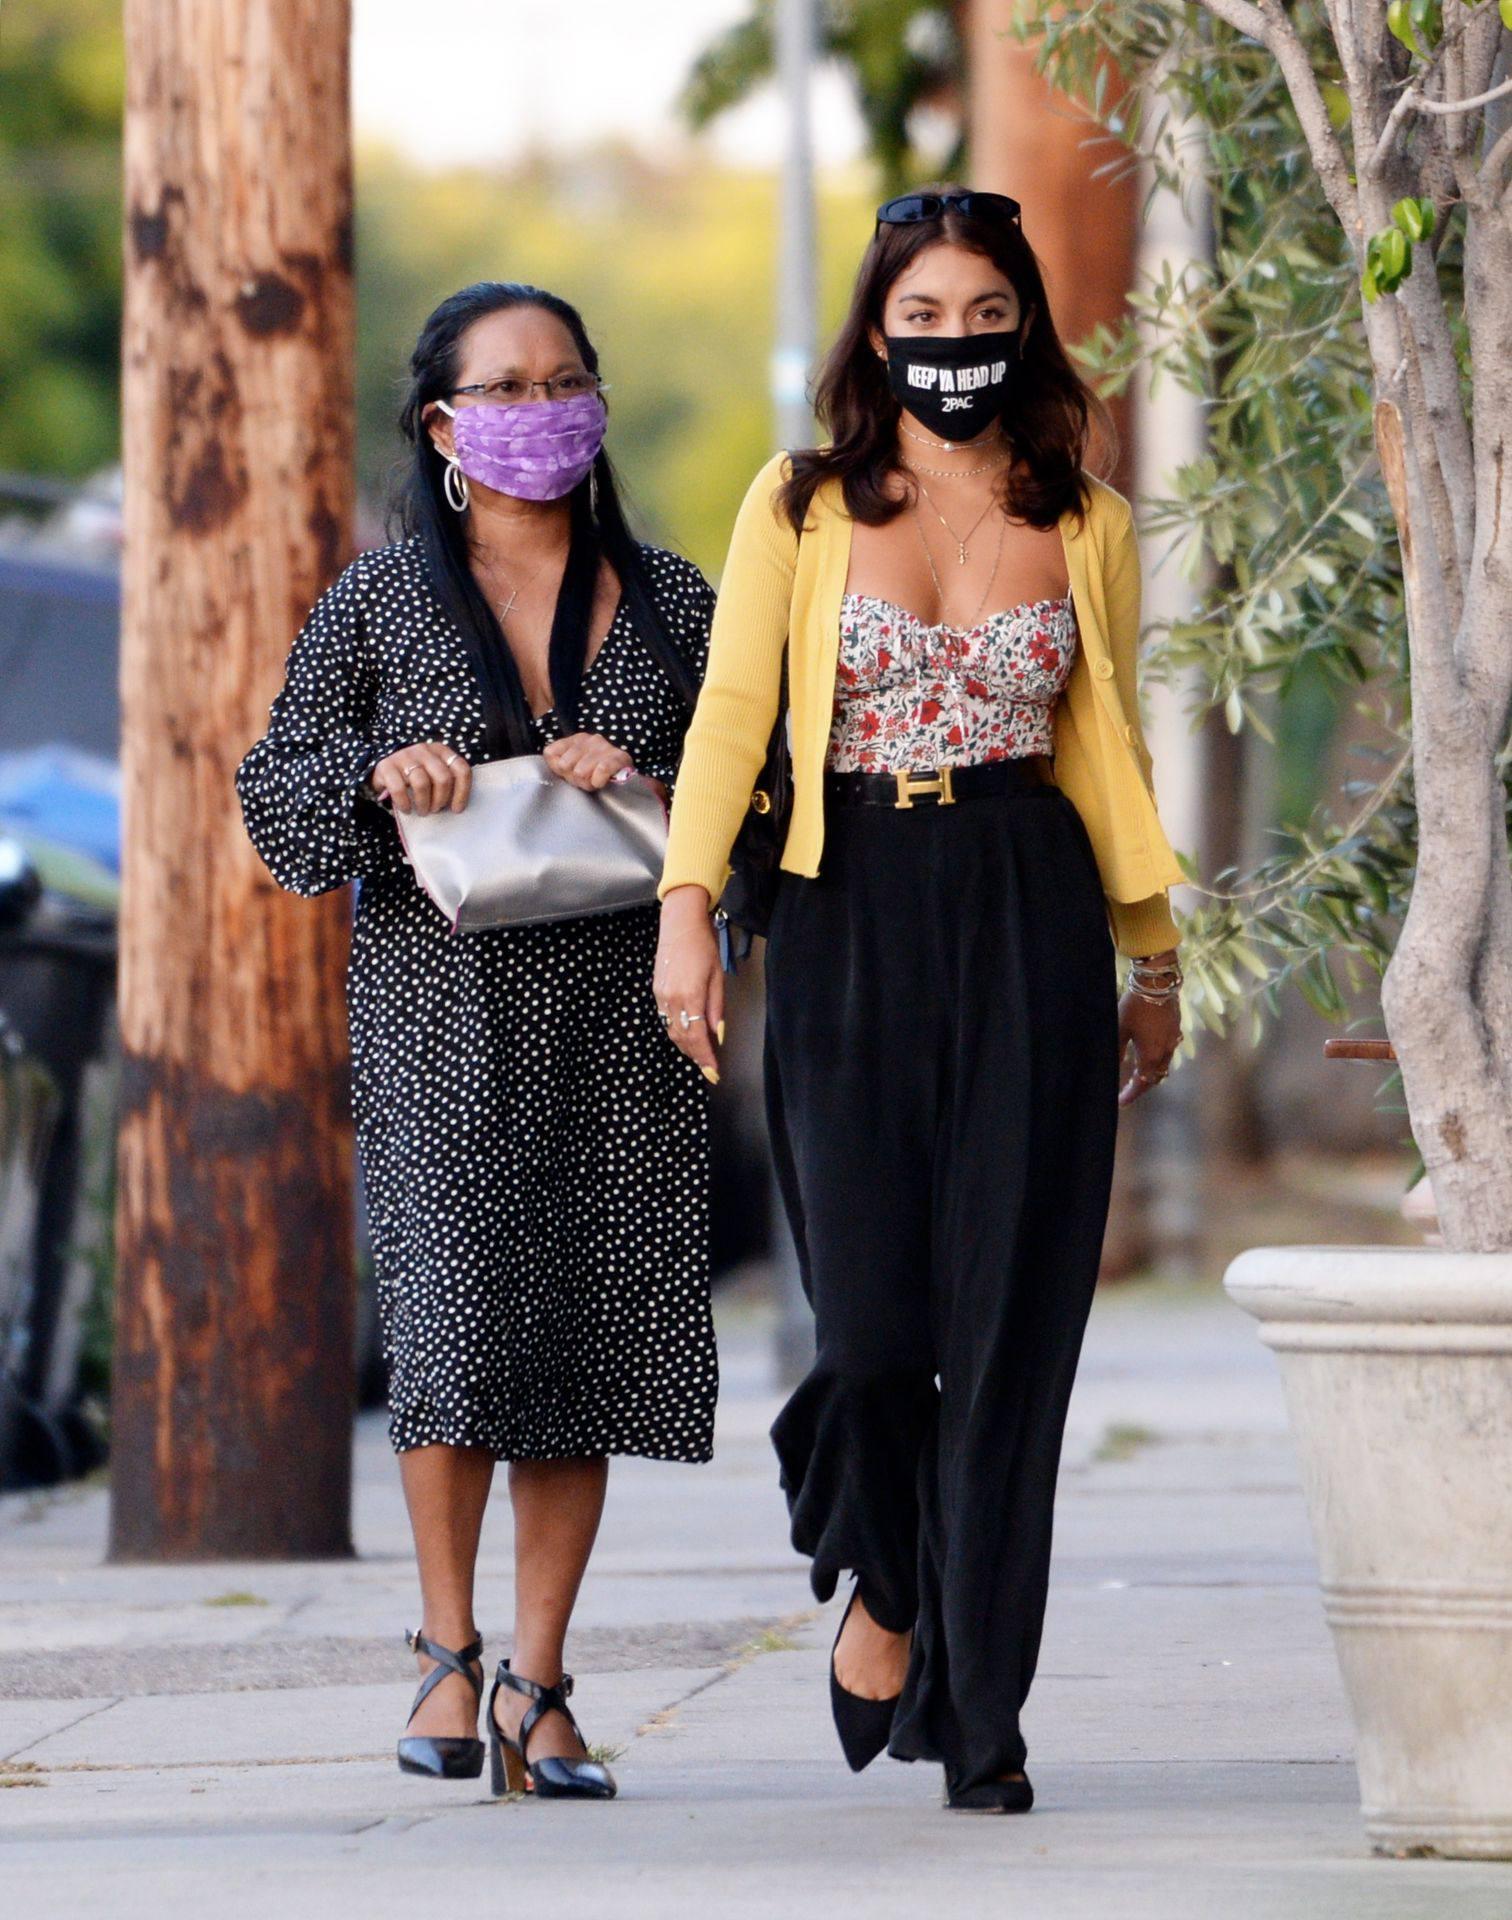 Vanessa Hudgens – Sexy Boobs And Ass At Farfalla In Los Angeles 0004